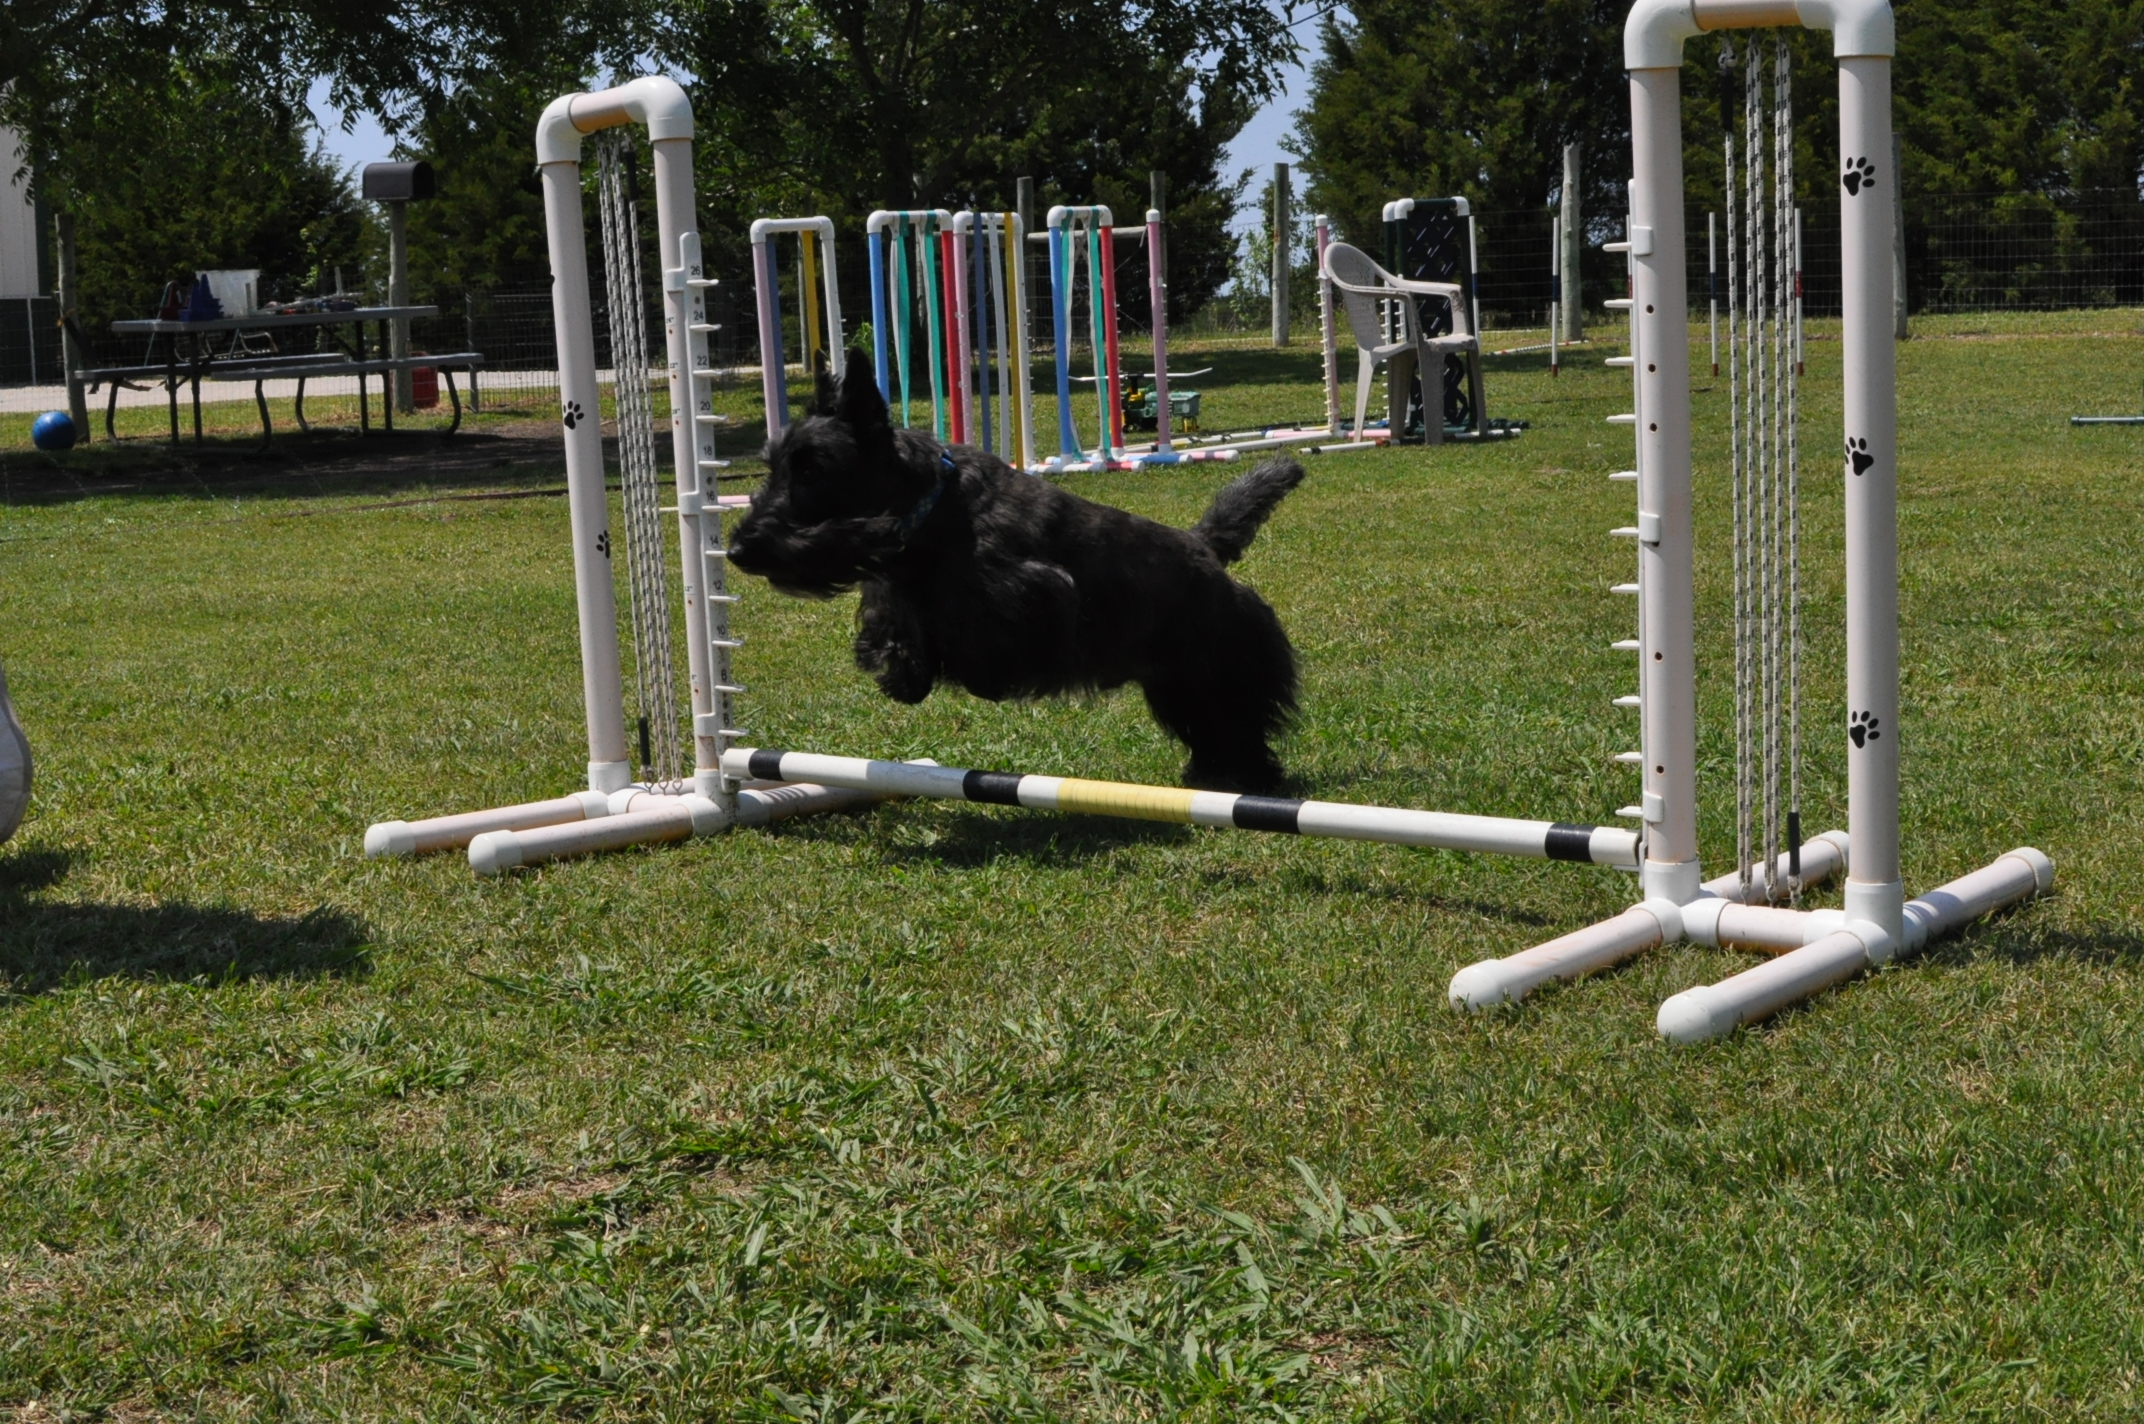 Toby agility